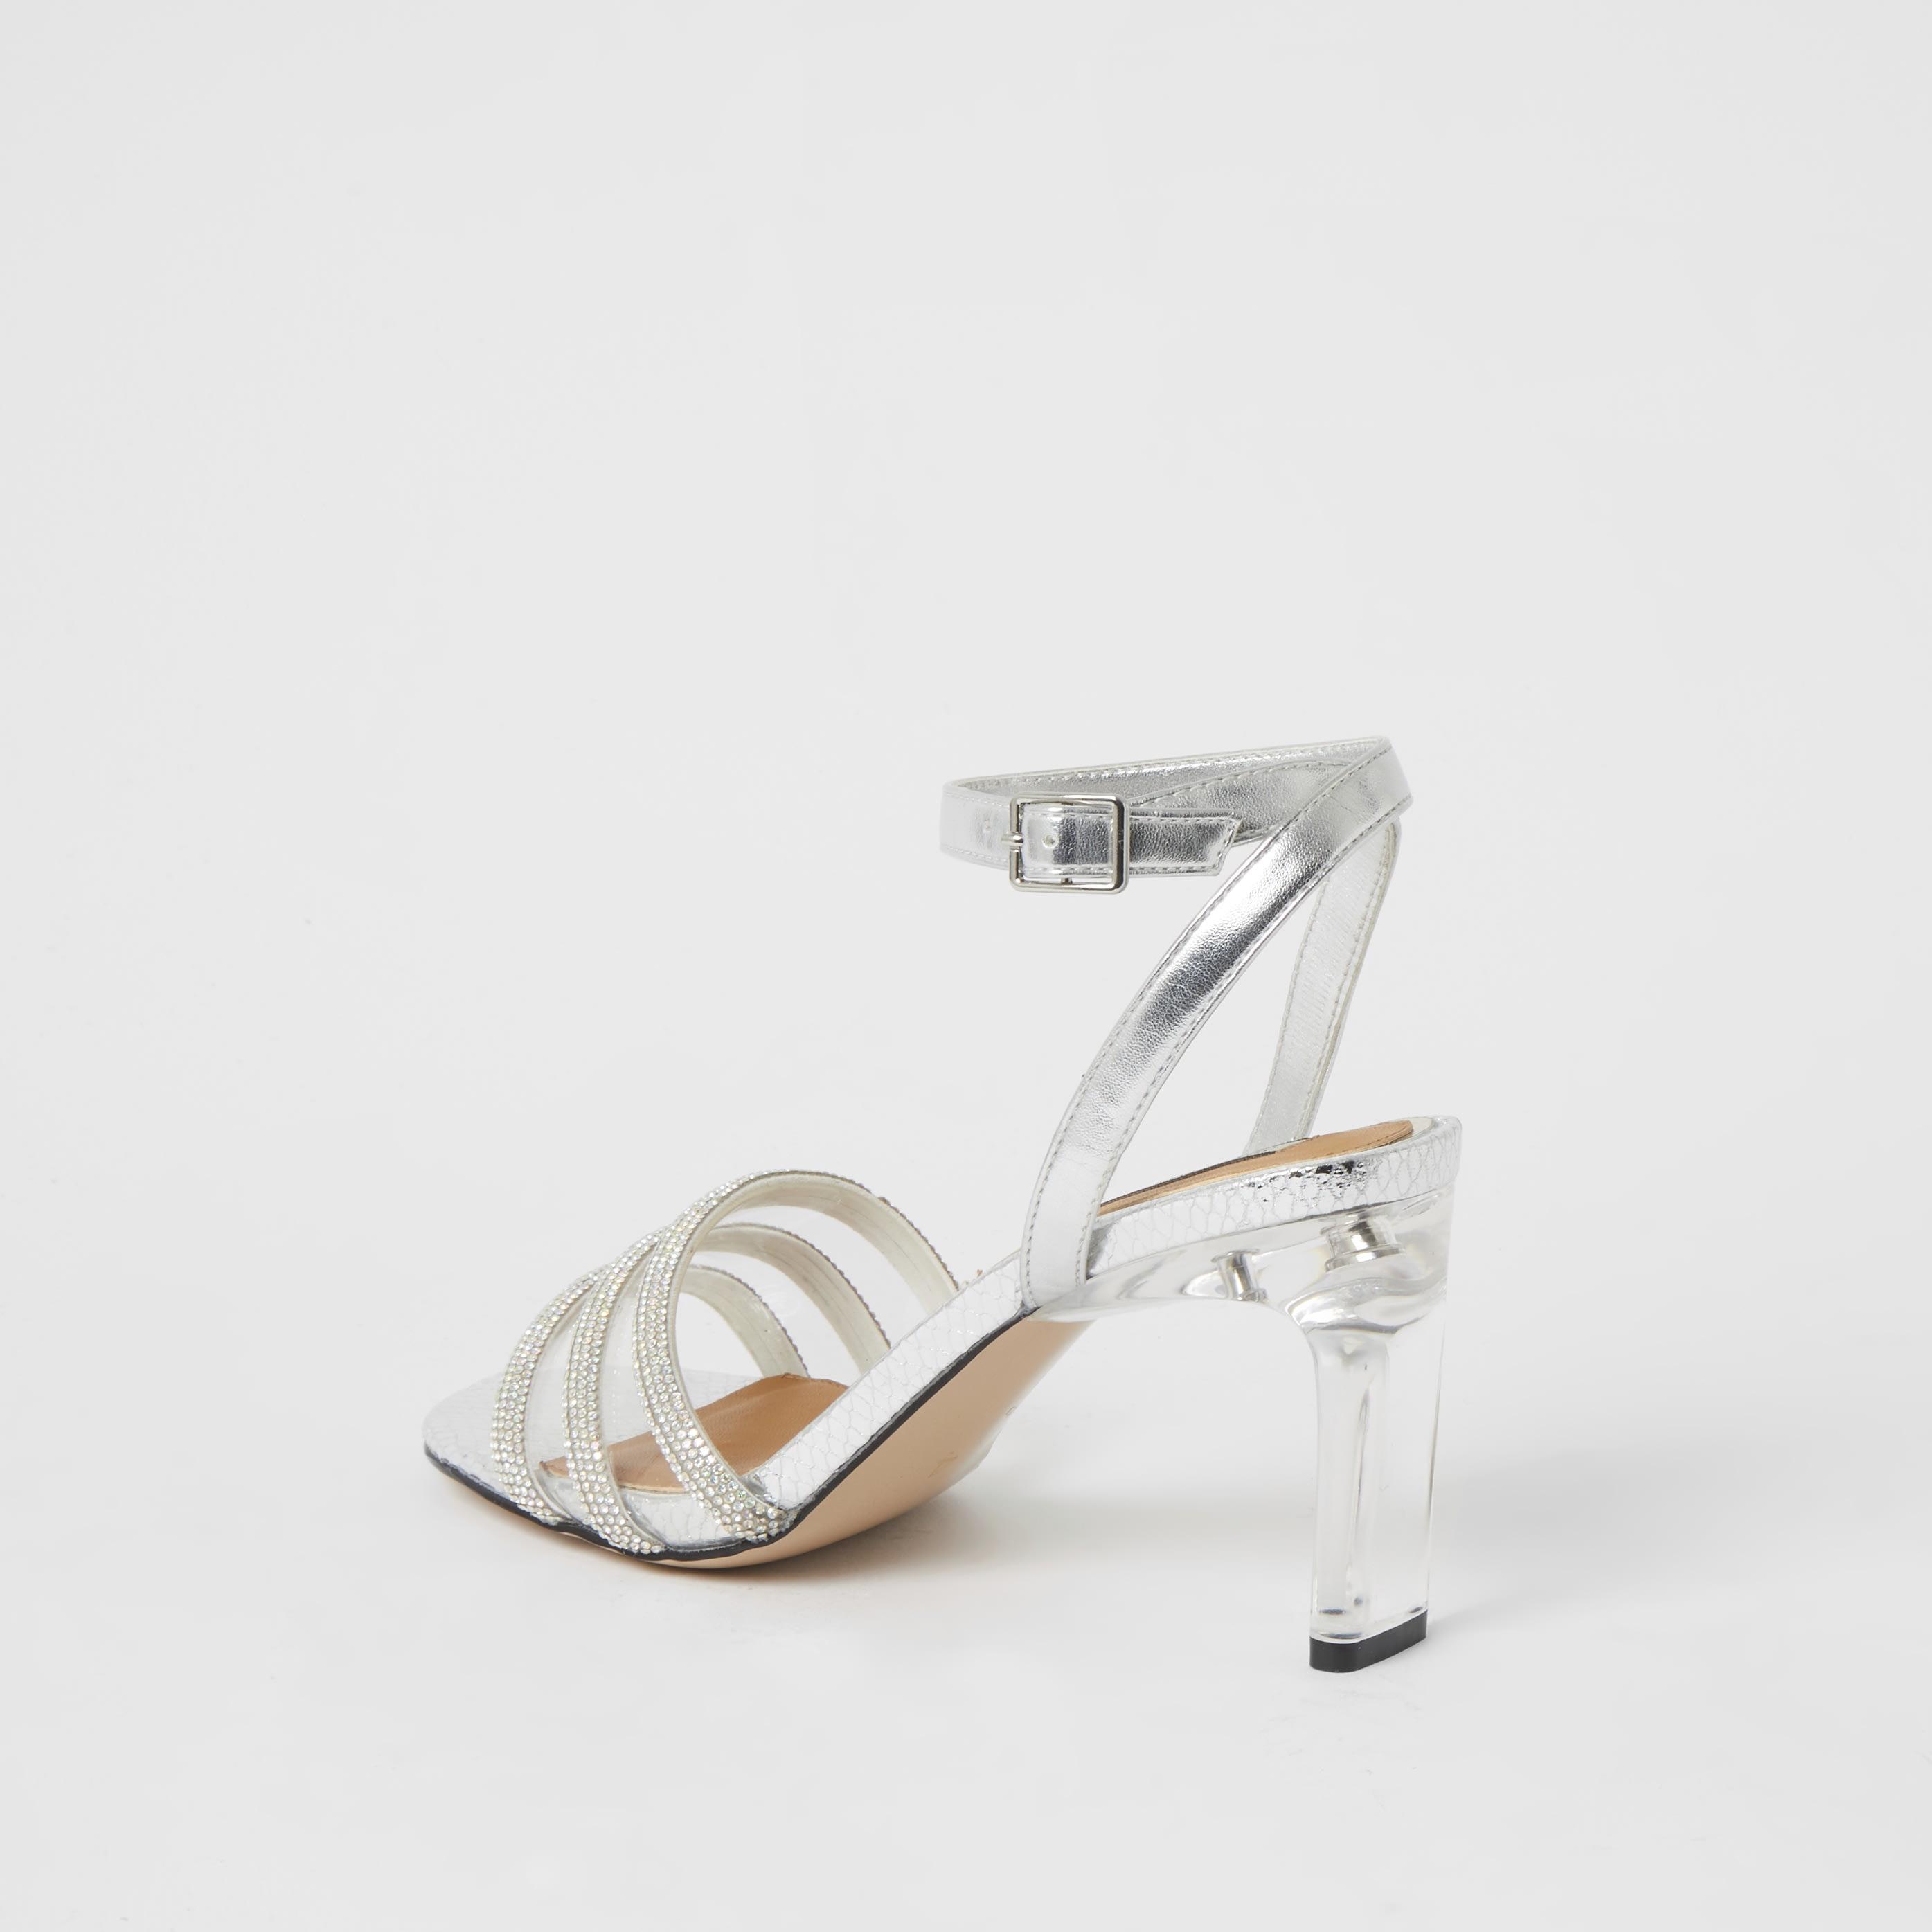 river island Womens Silver metallic diamante perspex heel sandals (6)